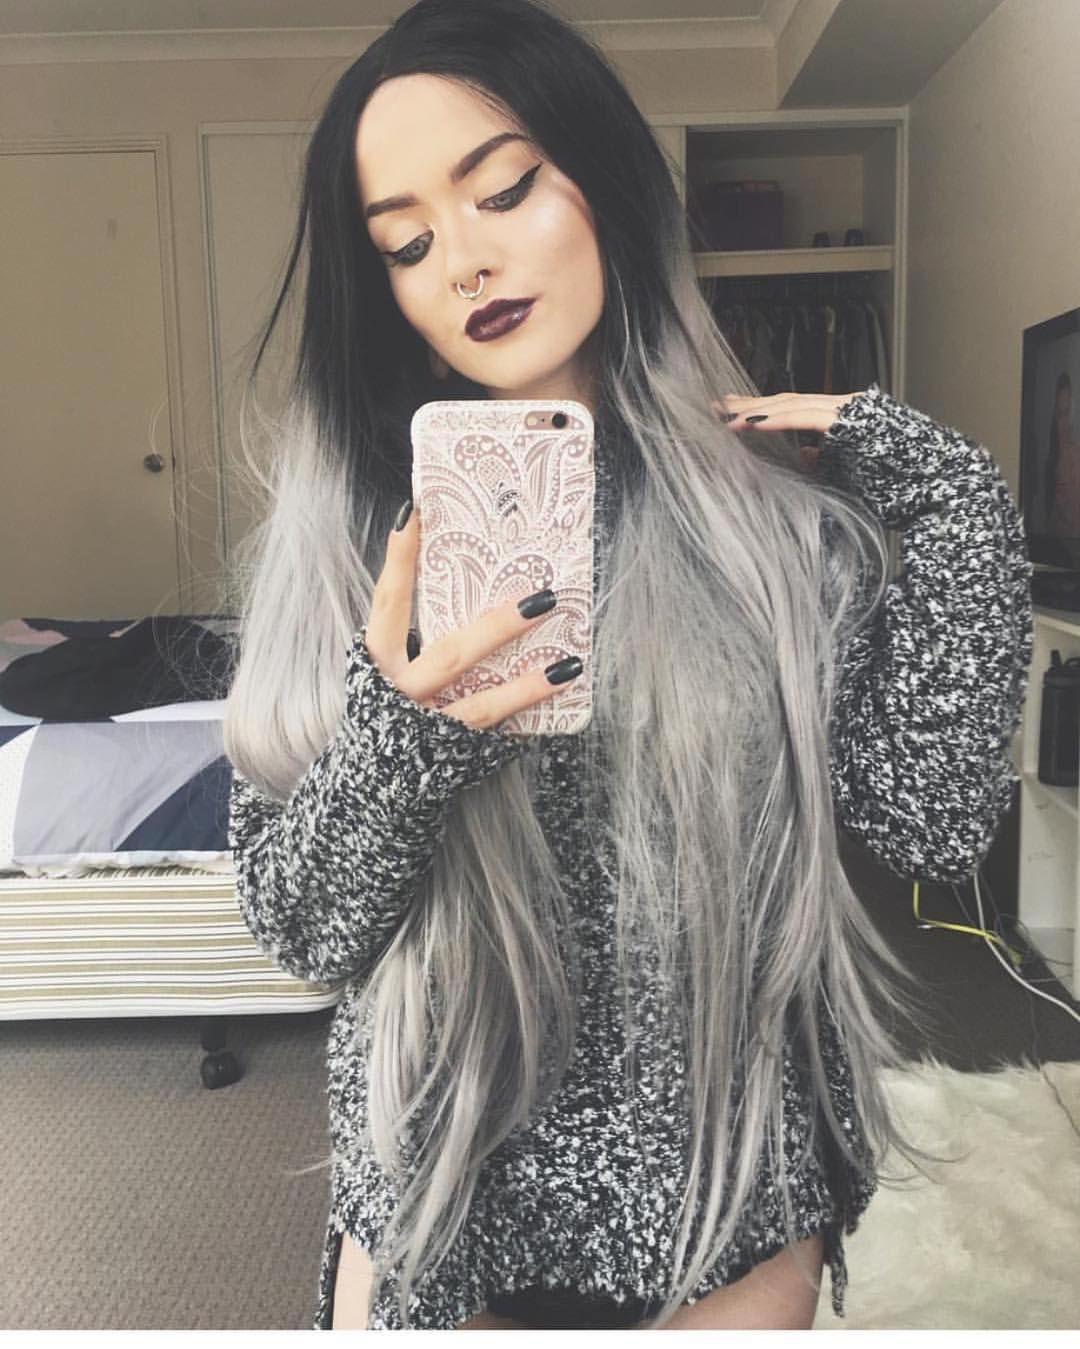 Gardensovergraveyards looks incredible in lush wigs style grey